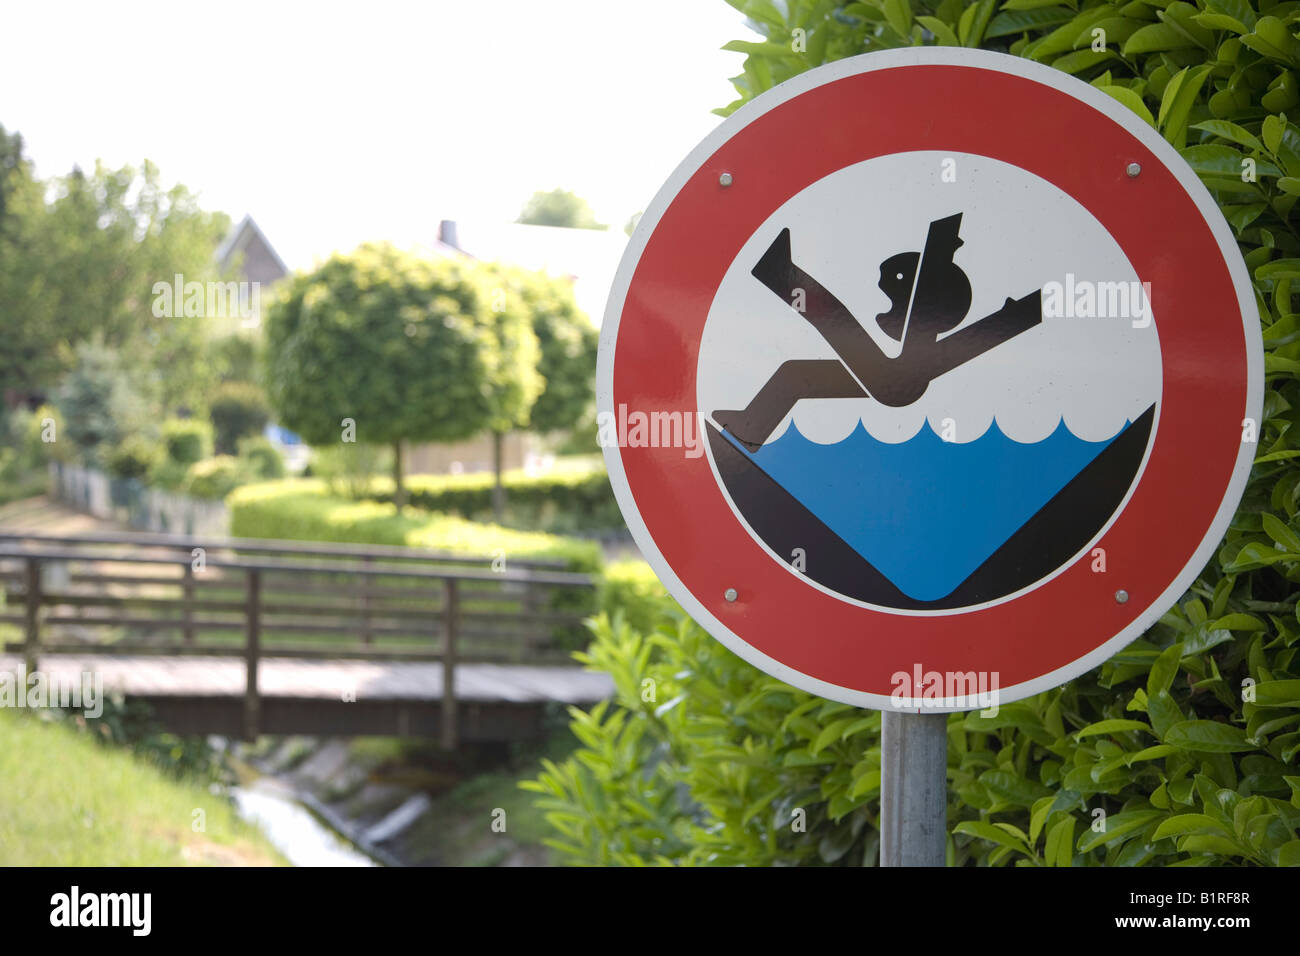 Warning sign in front of a bridge, joke sign, Raesfeld, Muensterland, North Rhine-Westphalia, Germany, Europe - Stock Image